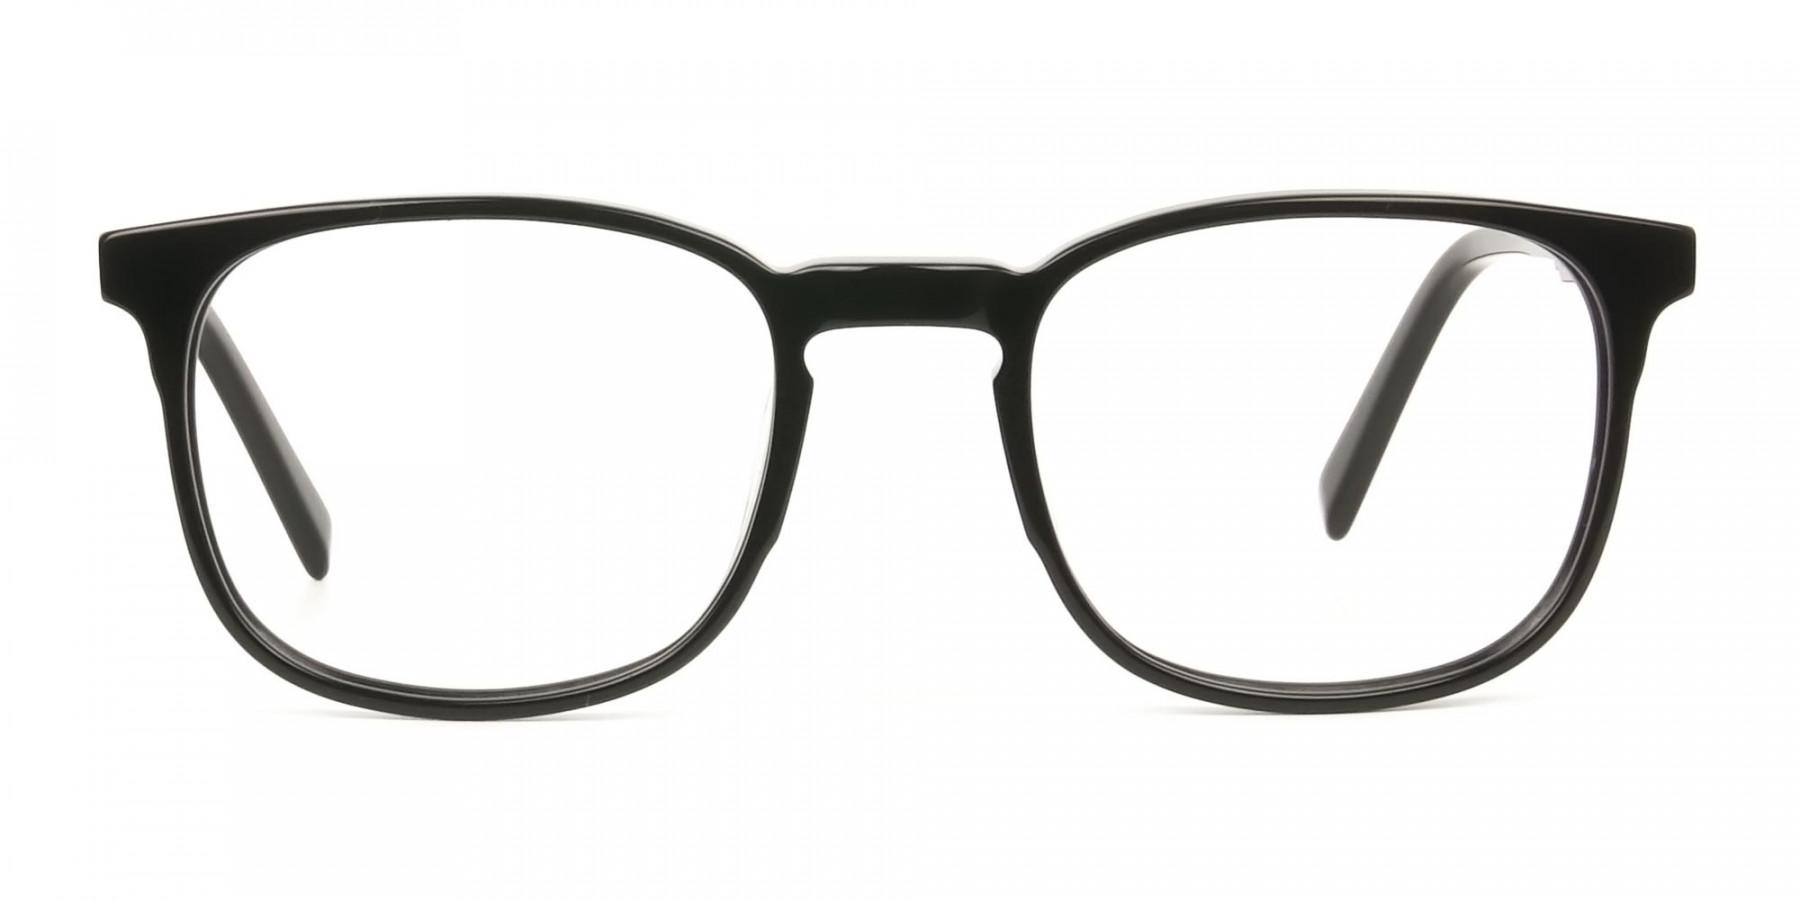 Sport Style Thick Big Black Square Glasses - 1